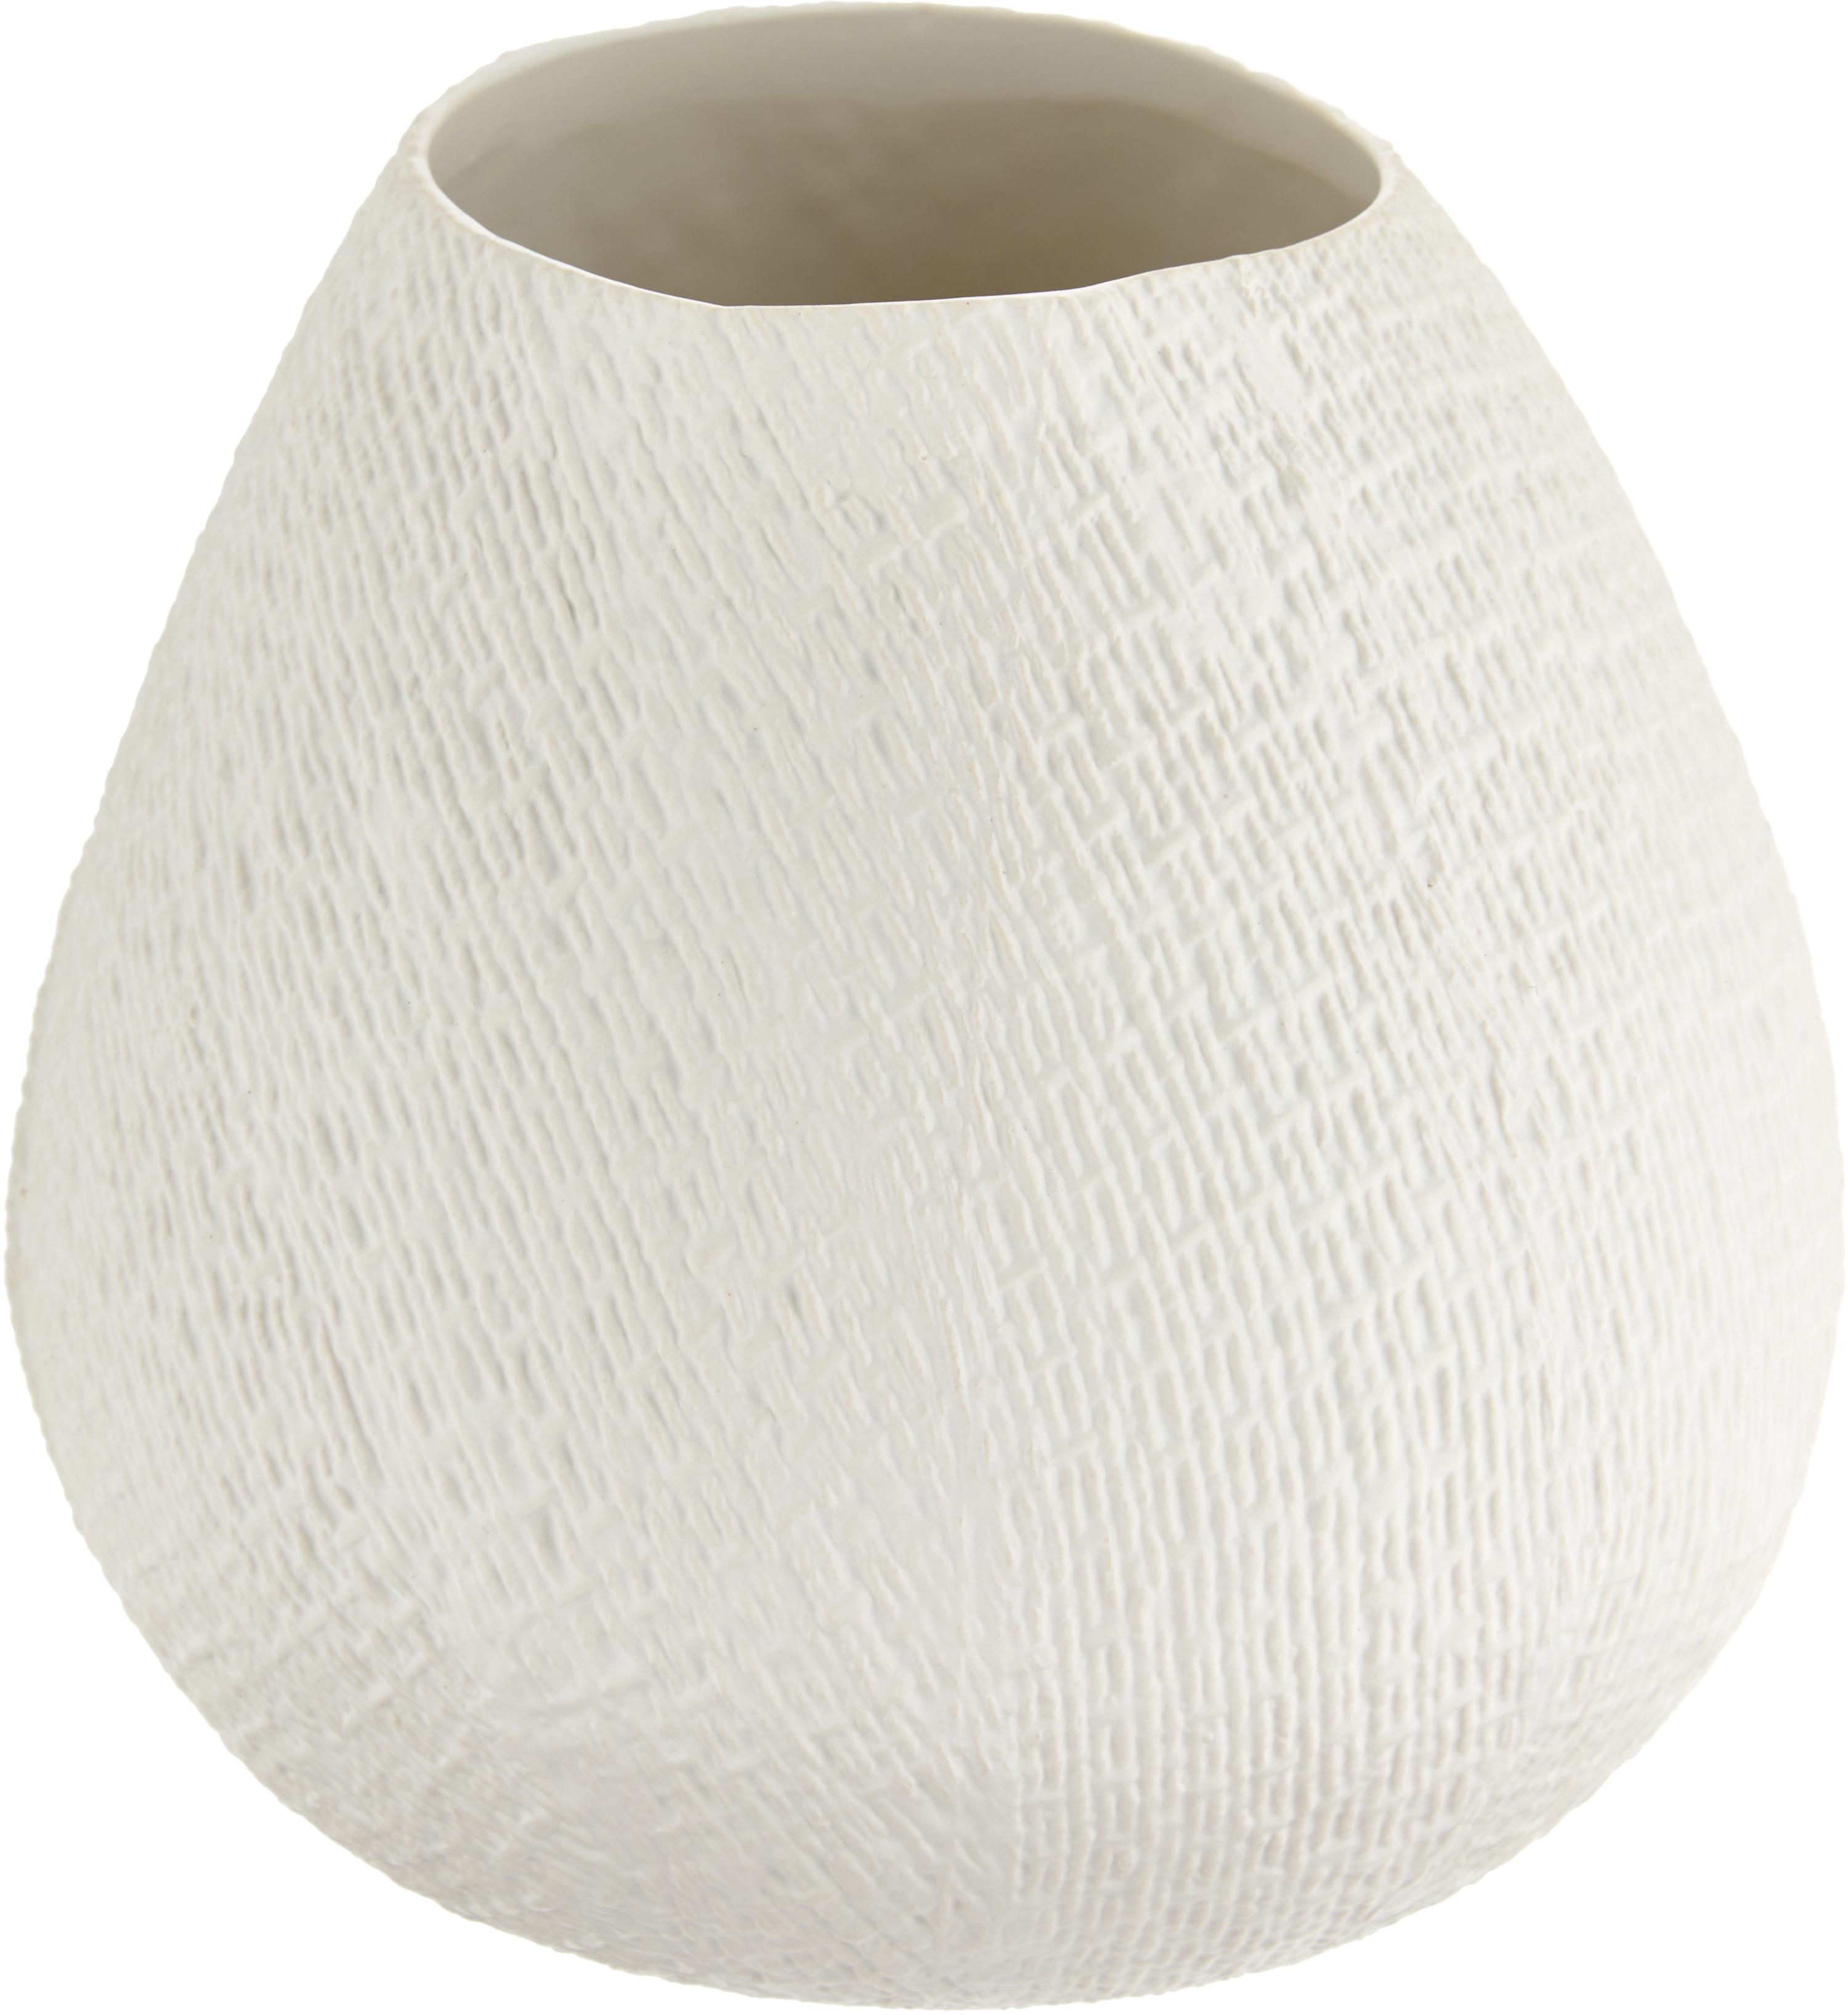 Jarrón artesanal Wendy, Cerámica, Blanco crema, mate, Ø 19 x H 20 cm